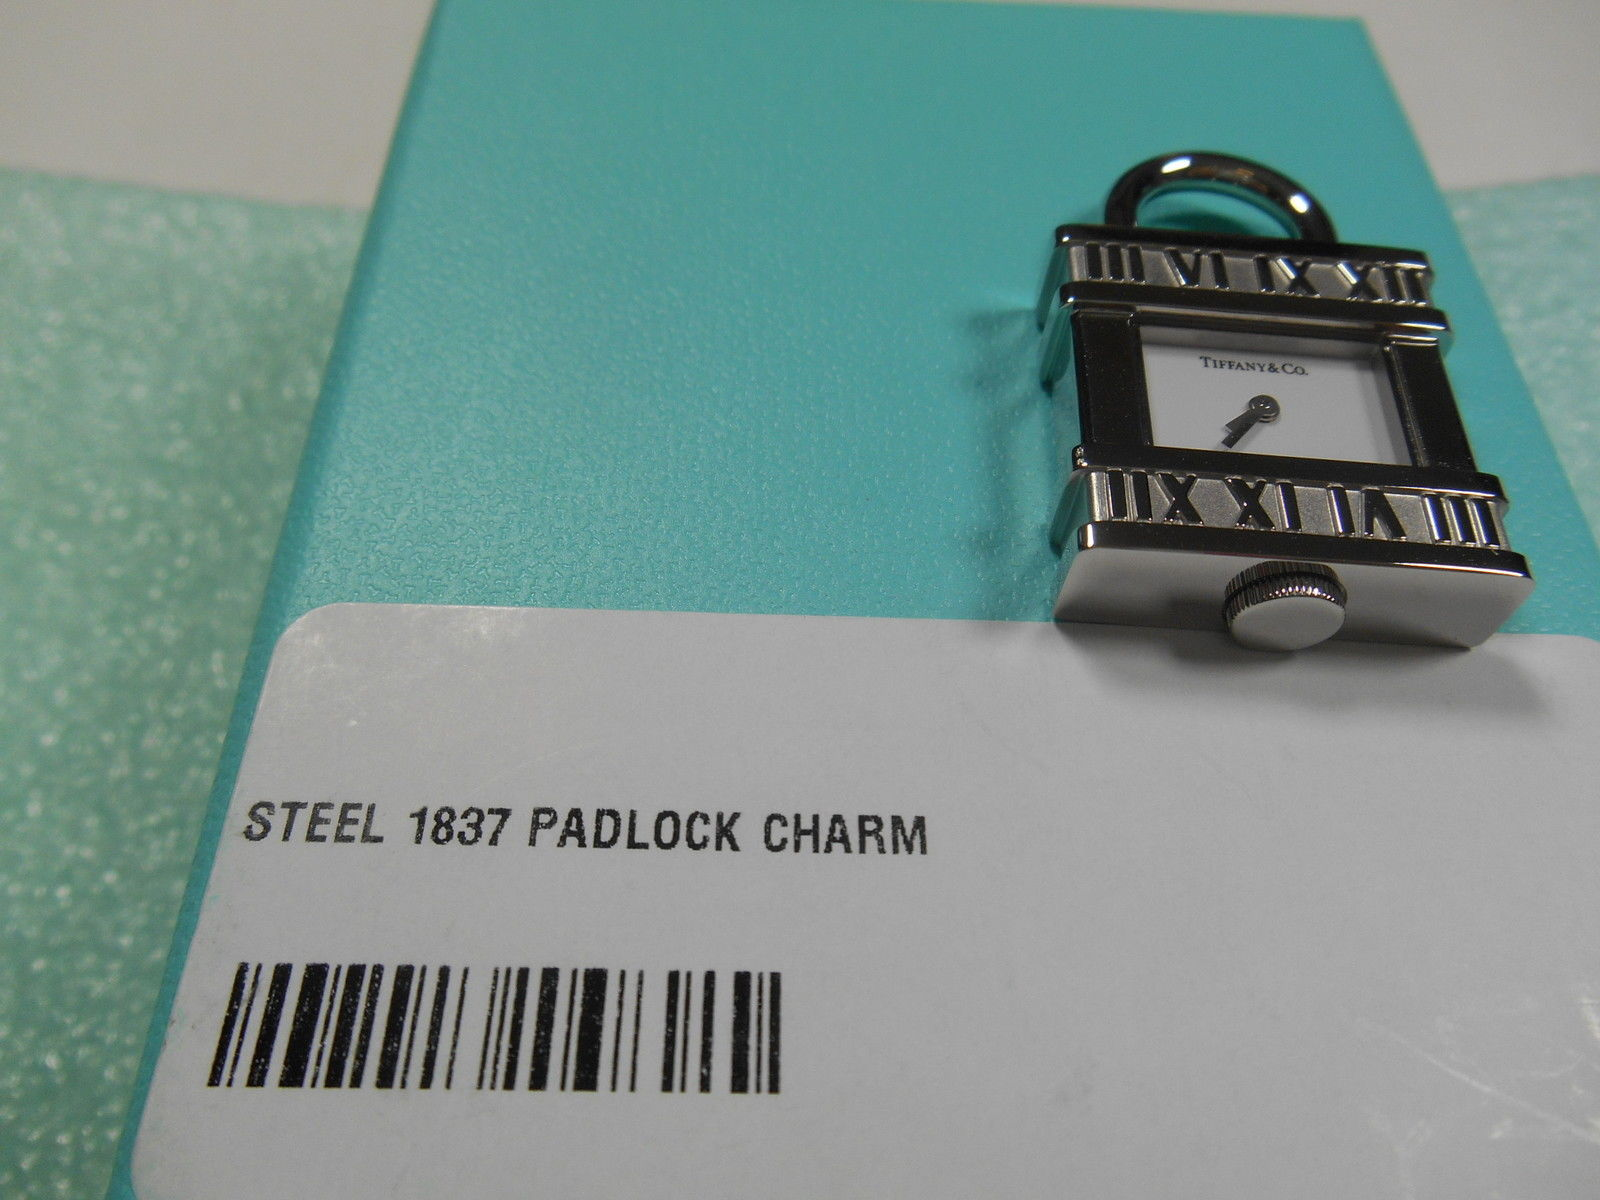 59a852995 NEW! Tiffany & Co Atlas Padlock Watch and 50 similar items